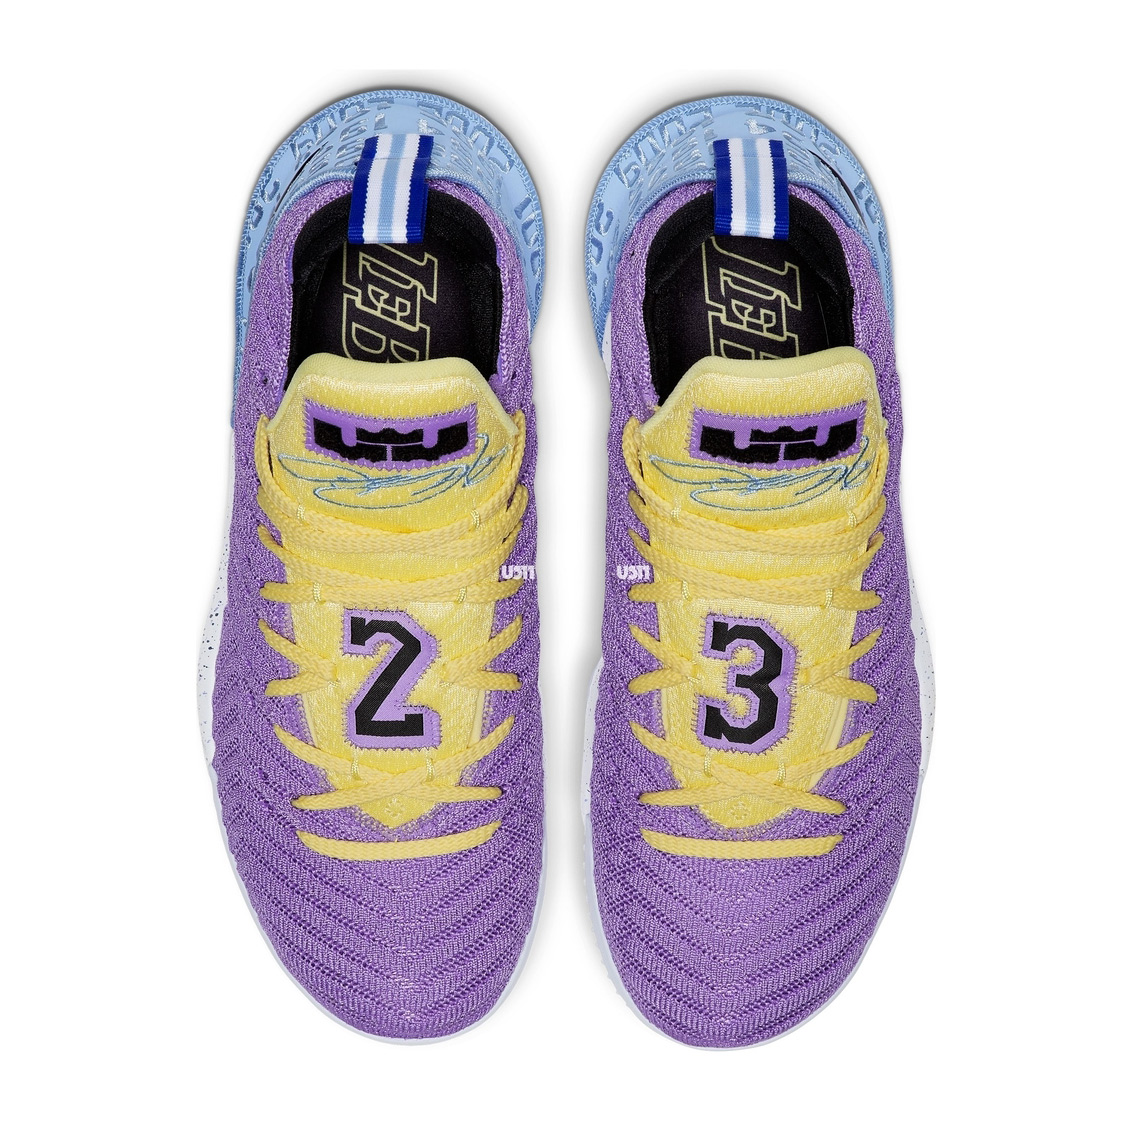 01a485b59fb9 Nike LeBron 16 Lakers Championships CK4765-500